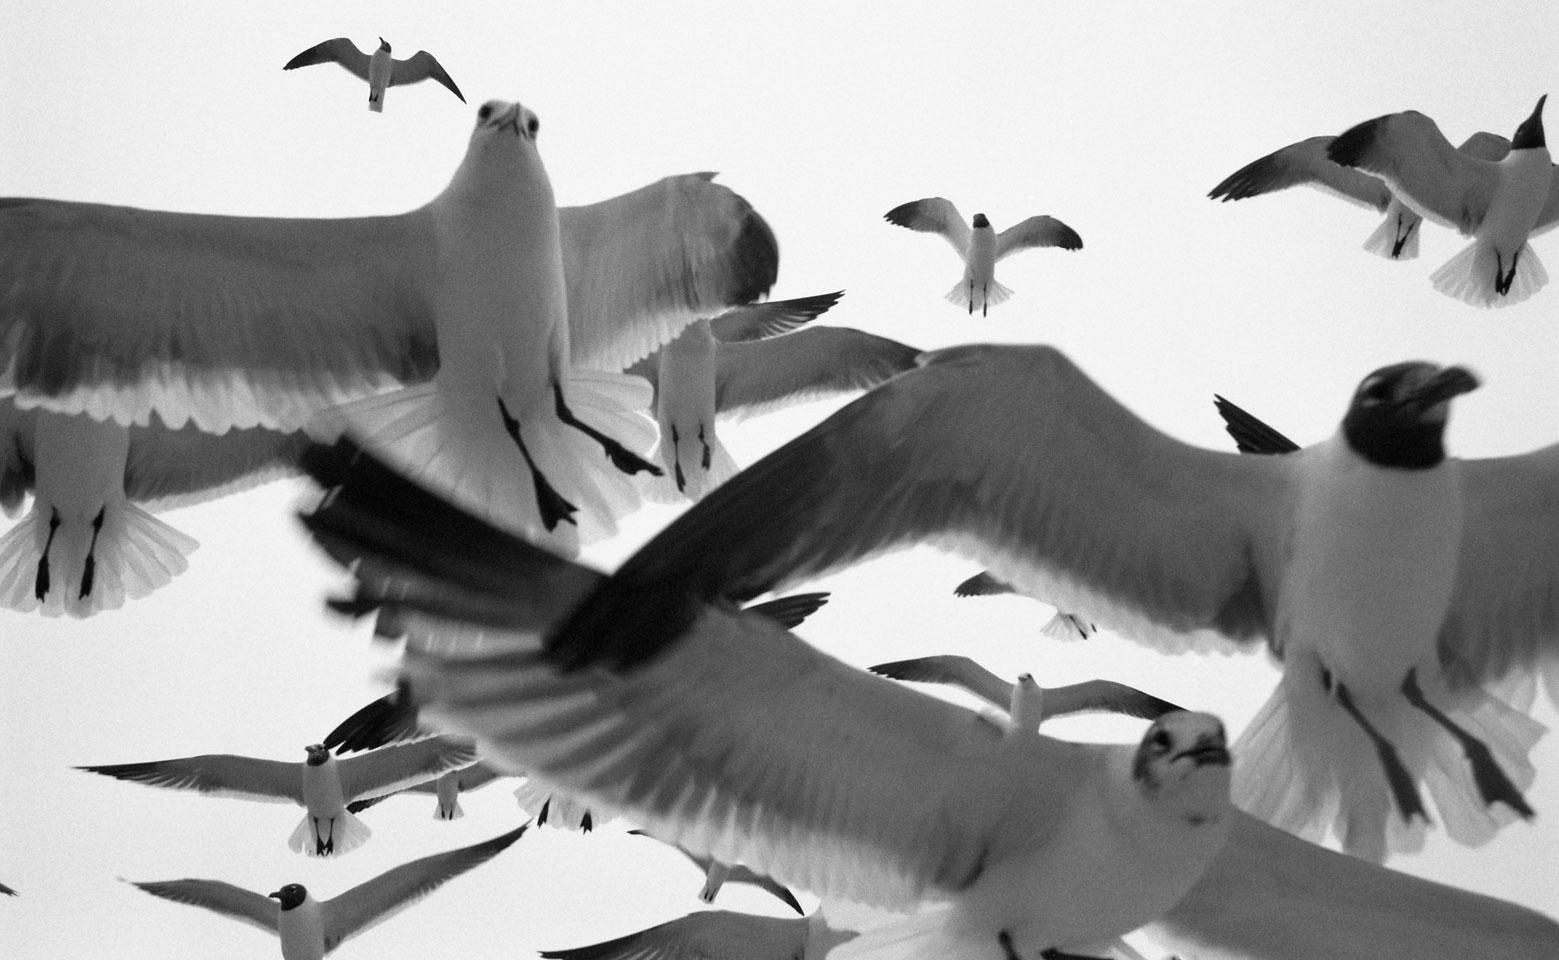 Gulf Gulls